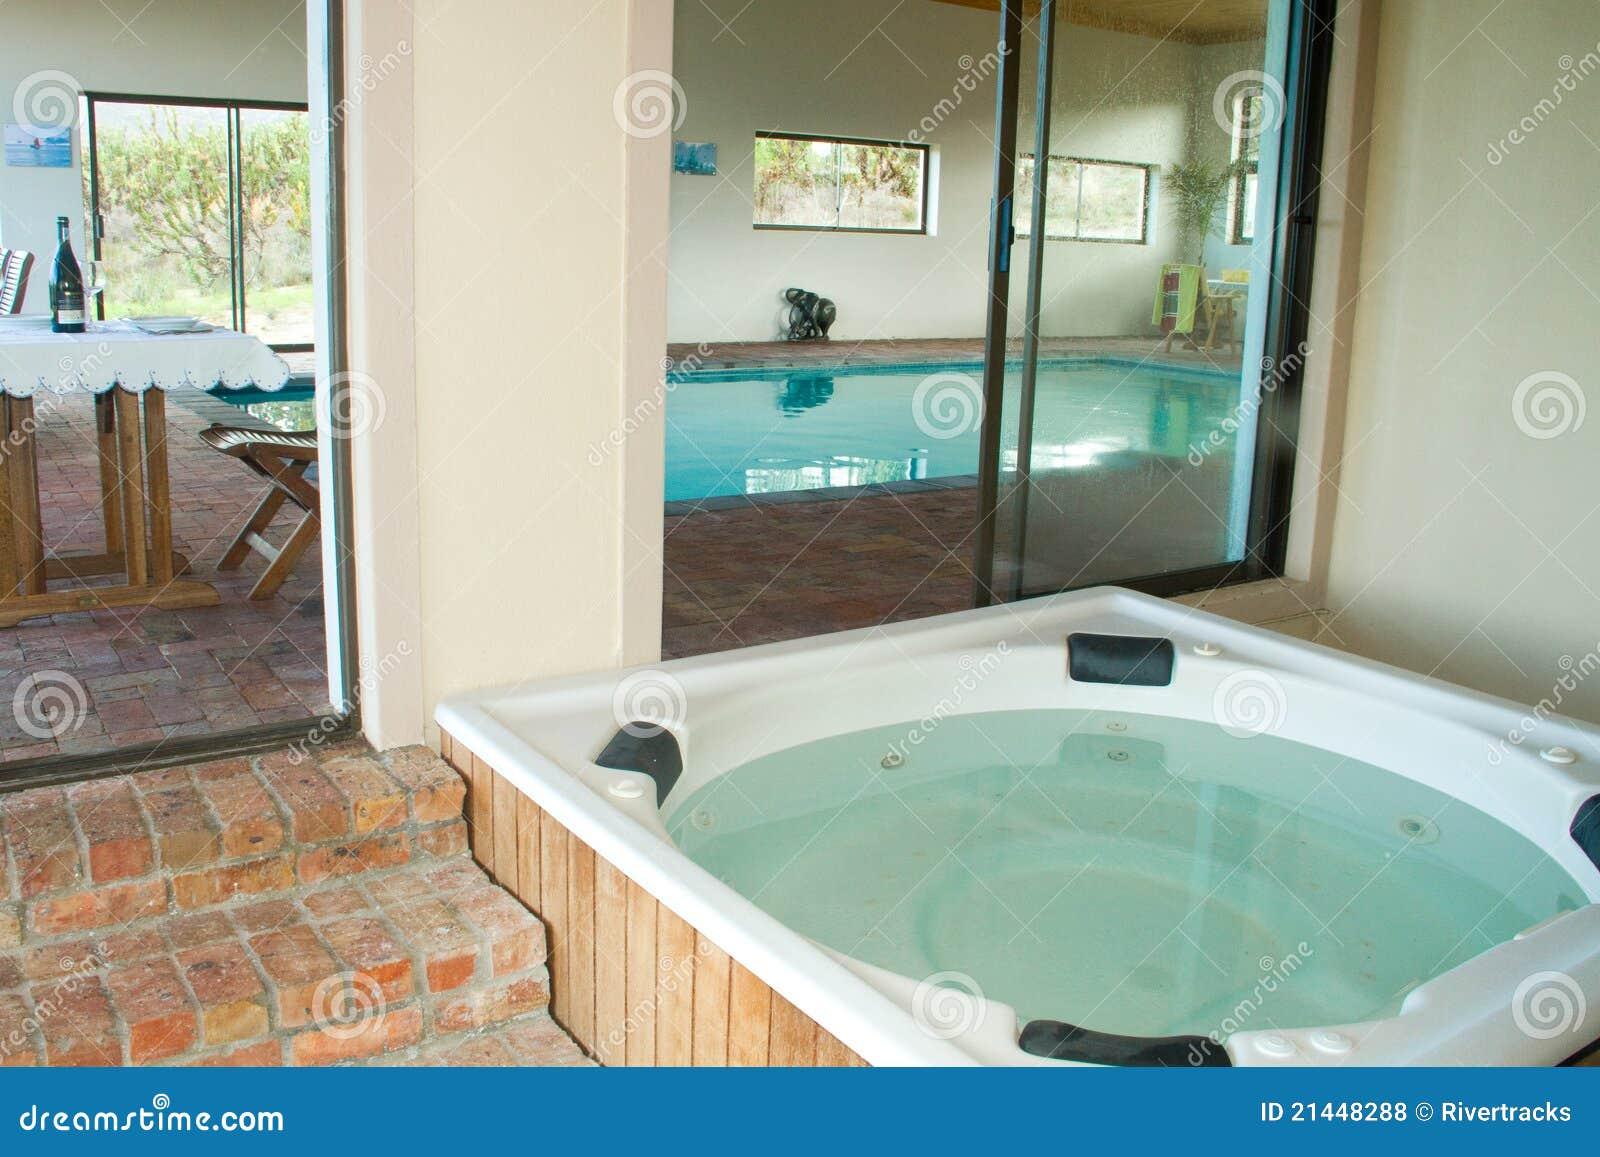 swimming pool jacuzzi vice ganda shows off his lavish. Black Bedroom Furniture Sets. Home Design Ideas